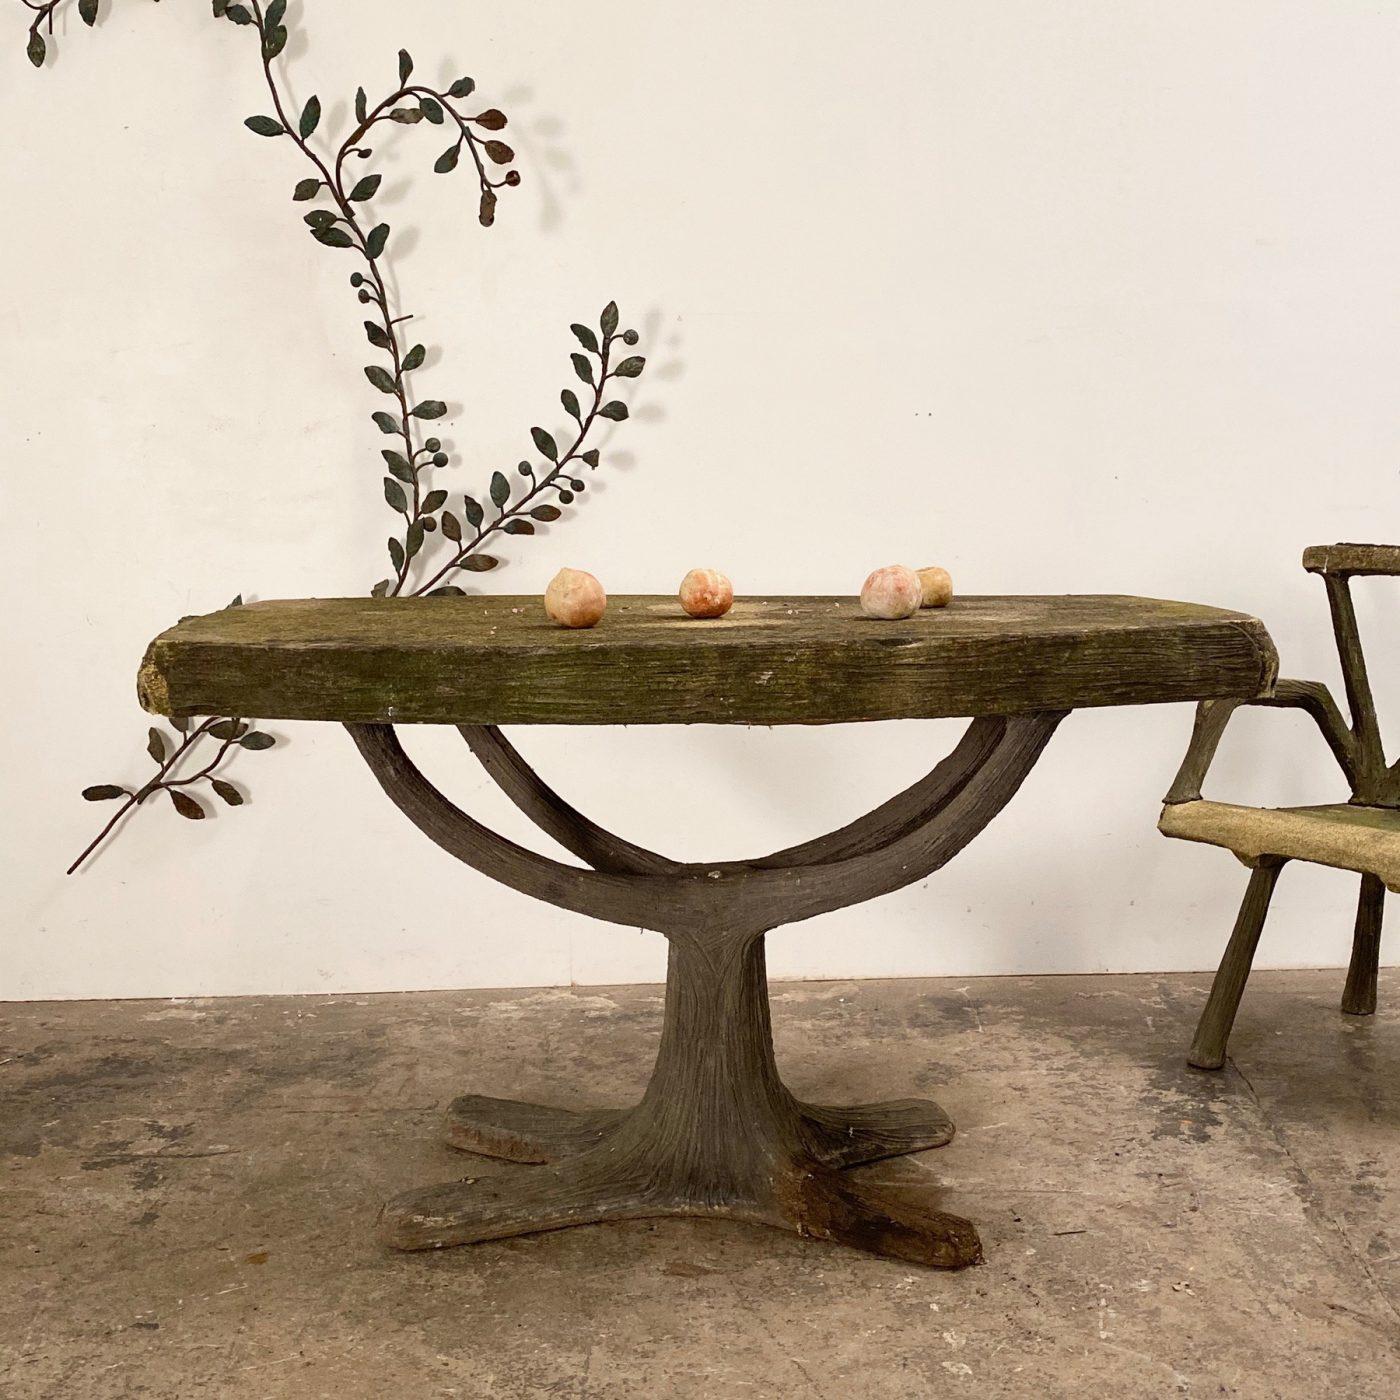 objet-vagabond-garden-set0009